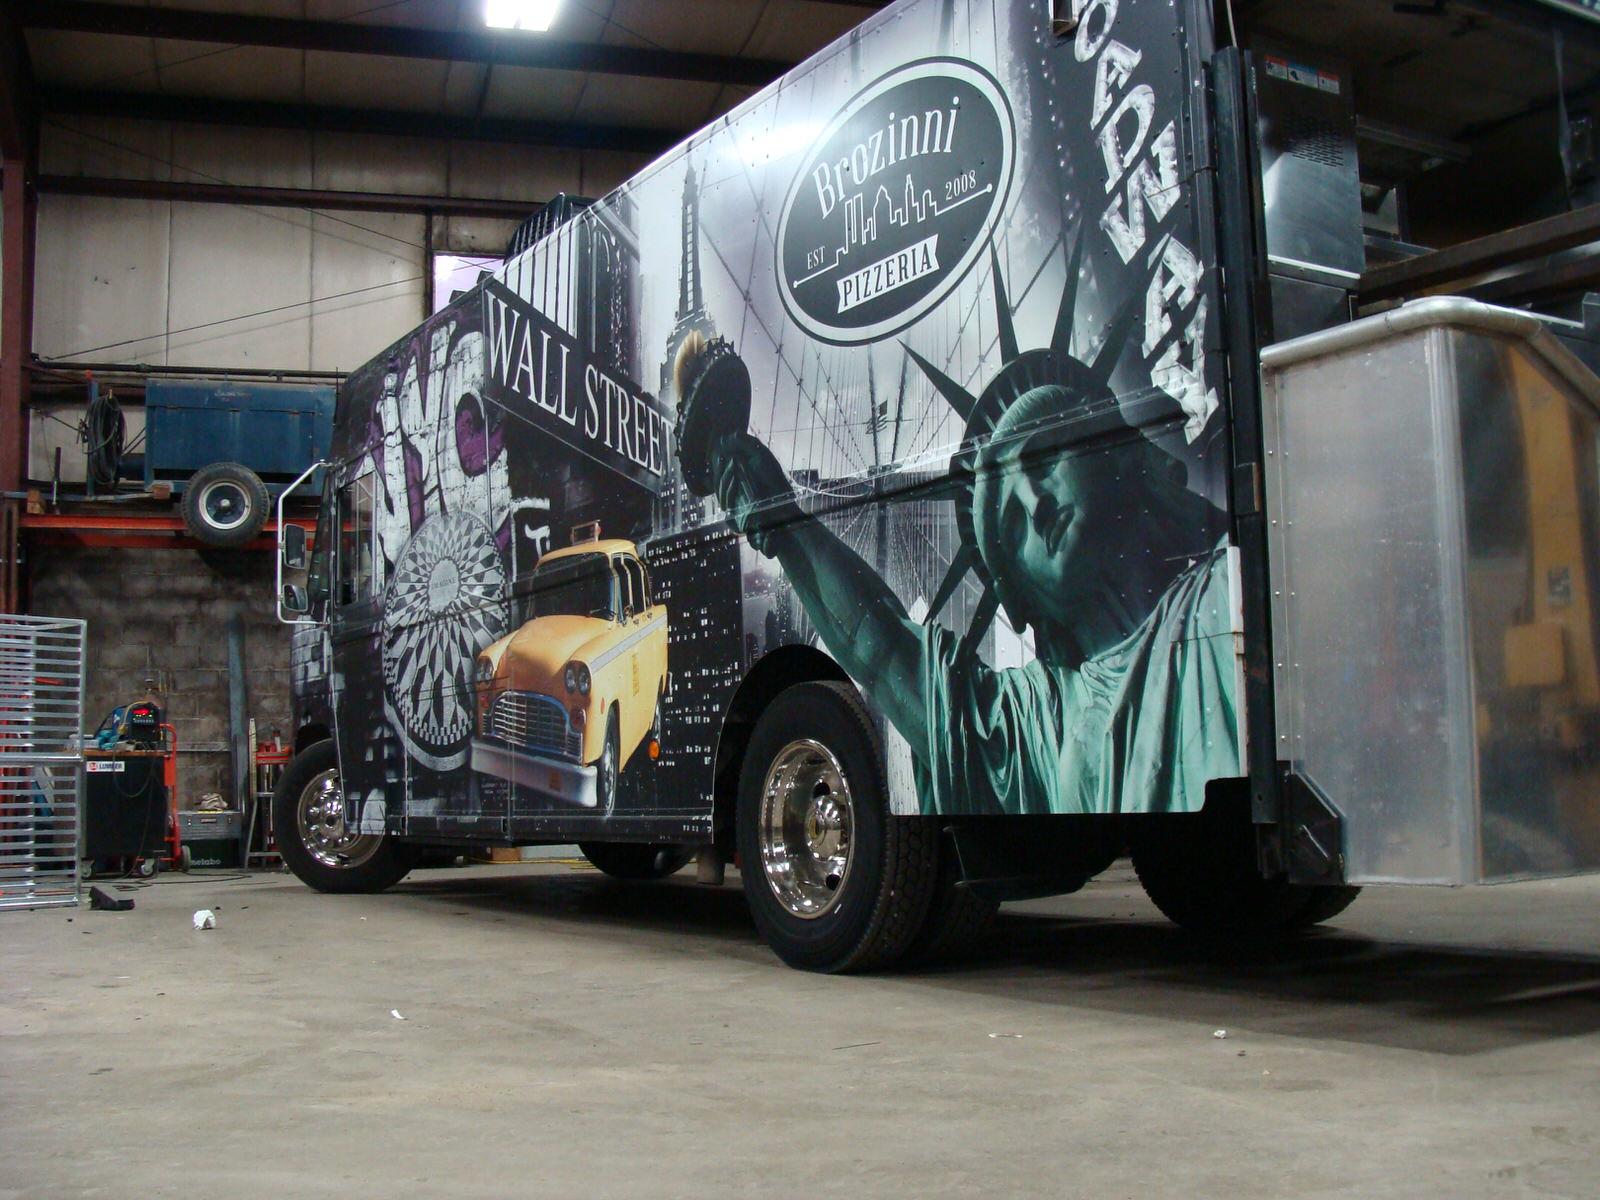 The Brozinni Pizzeria truck in the Jezroc Metalworks workshop.